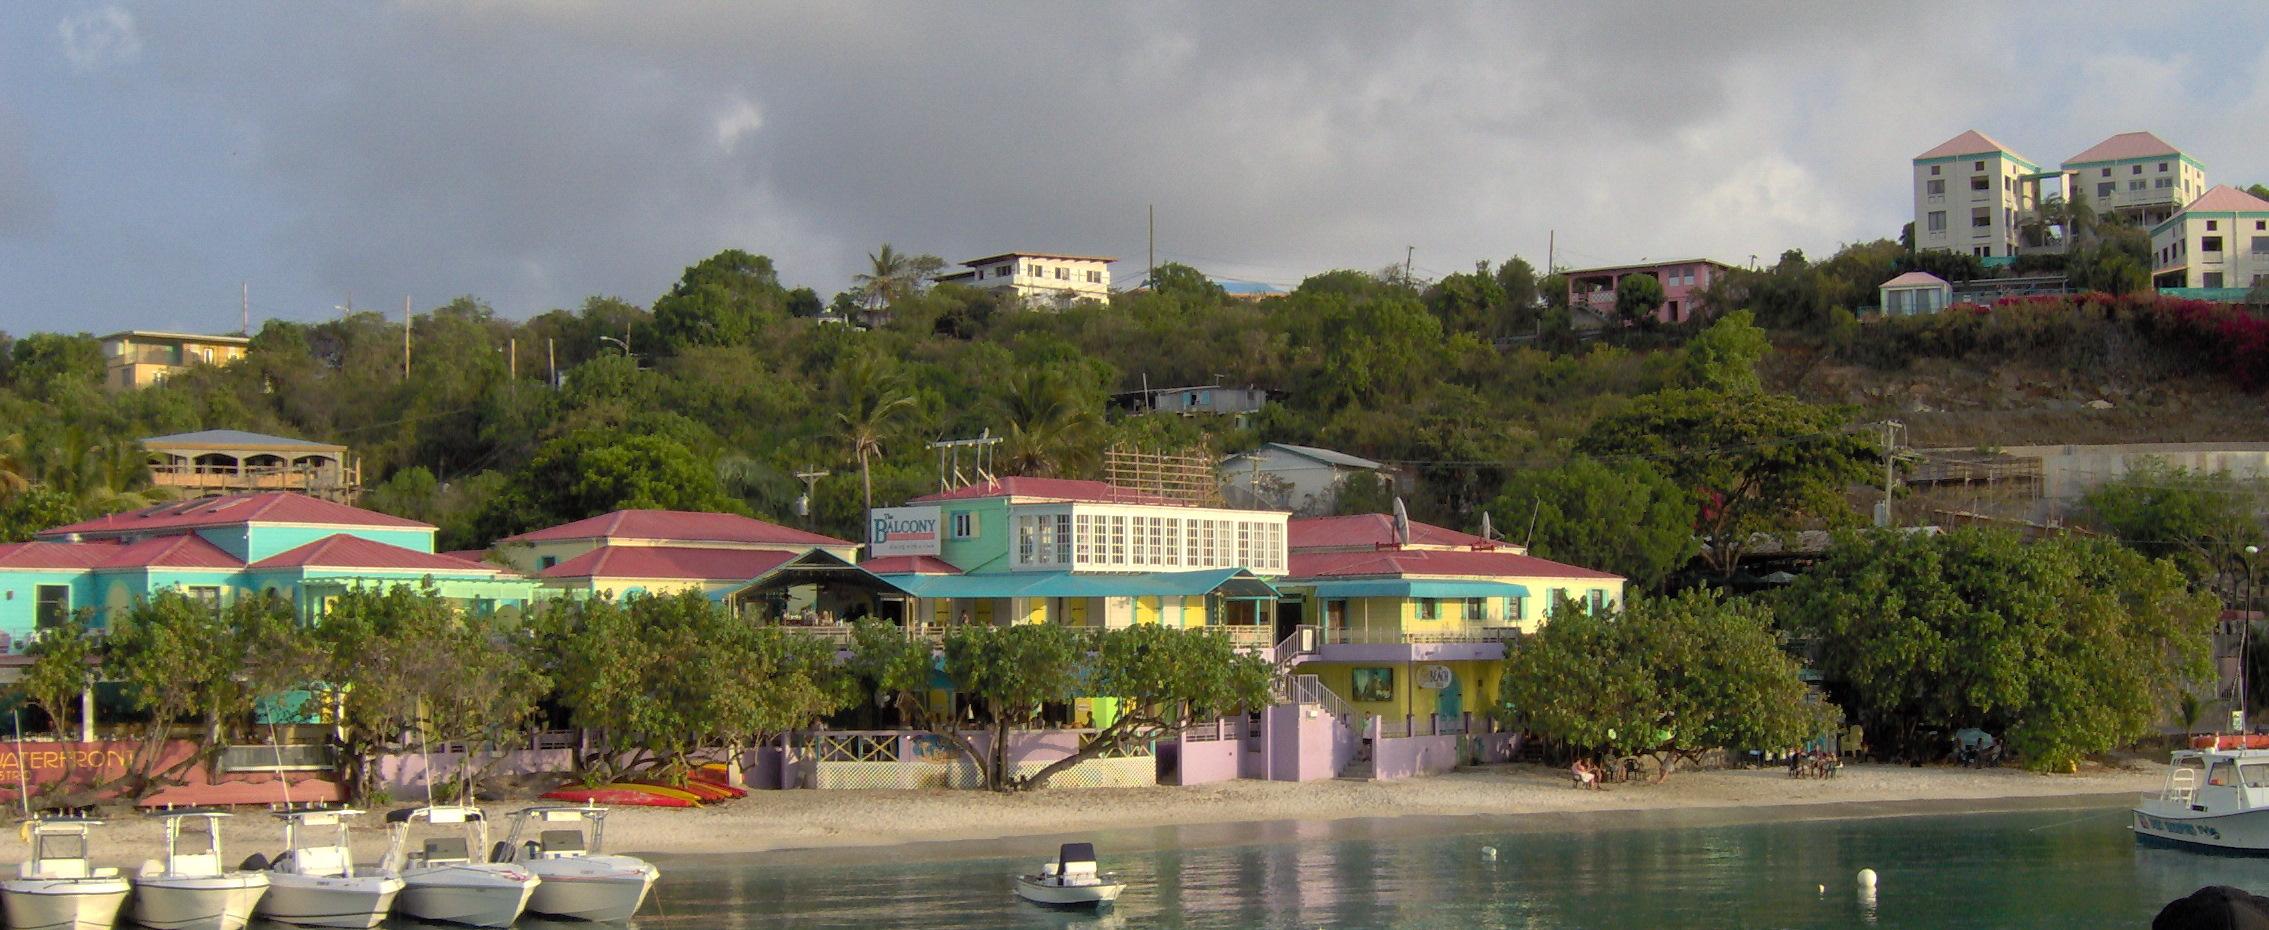 St Johns Virgin Island Churches Doc